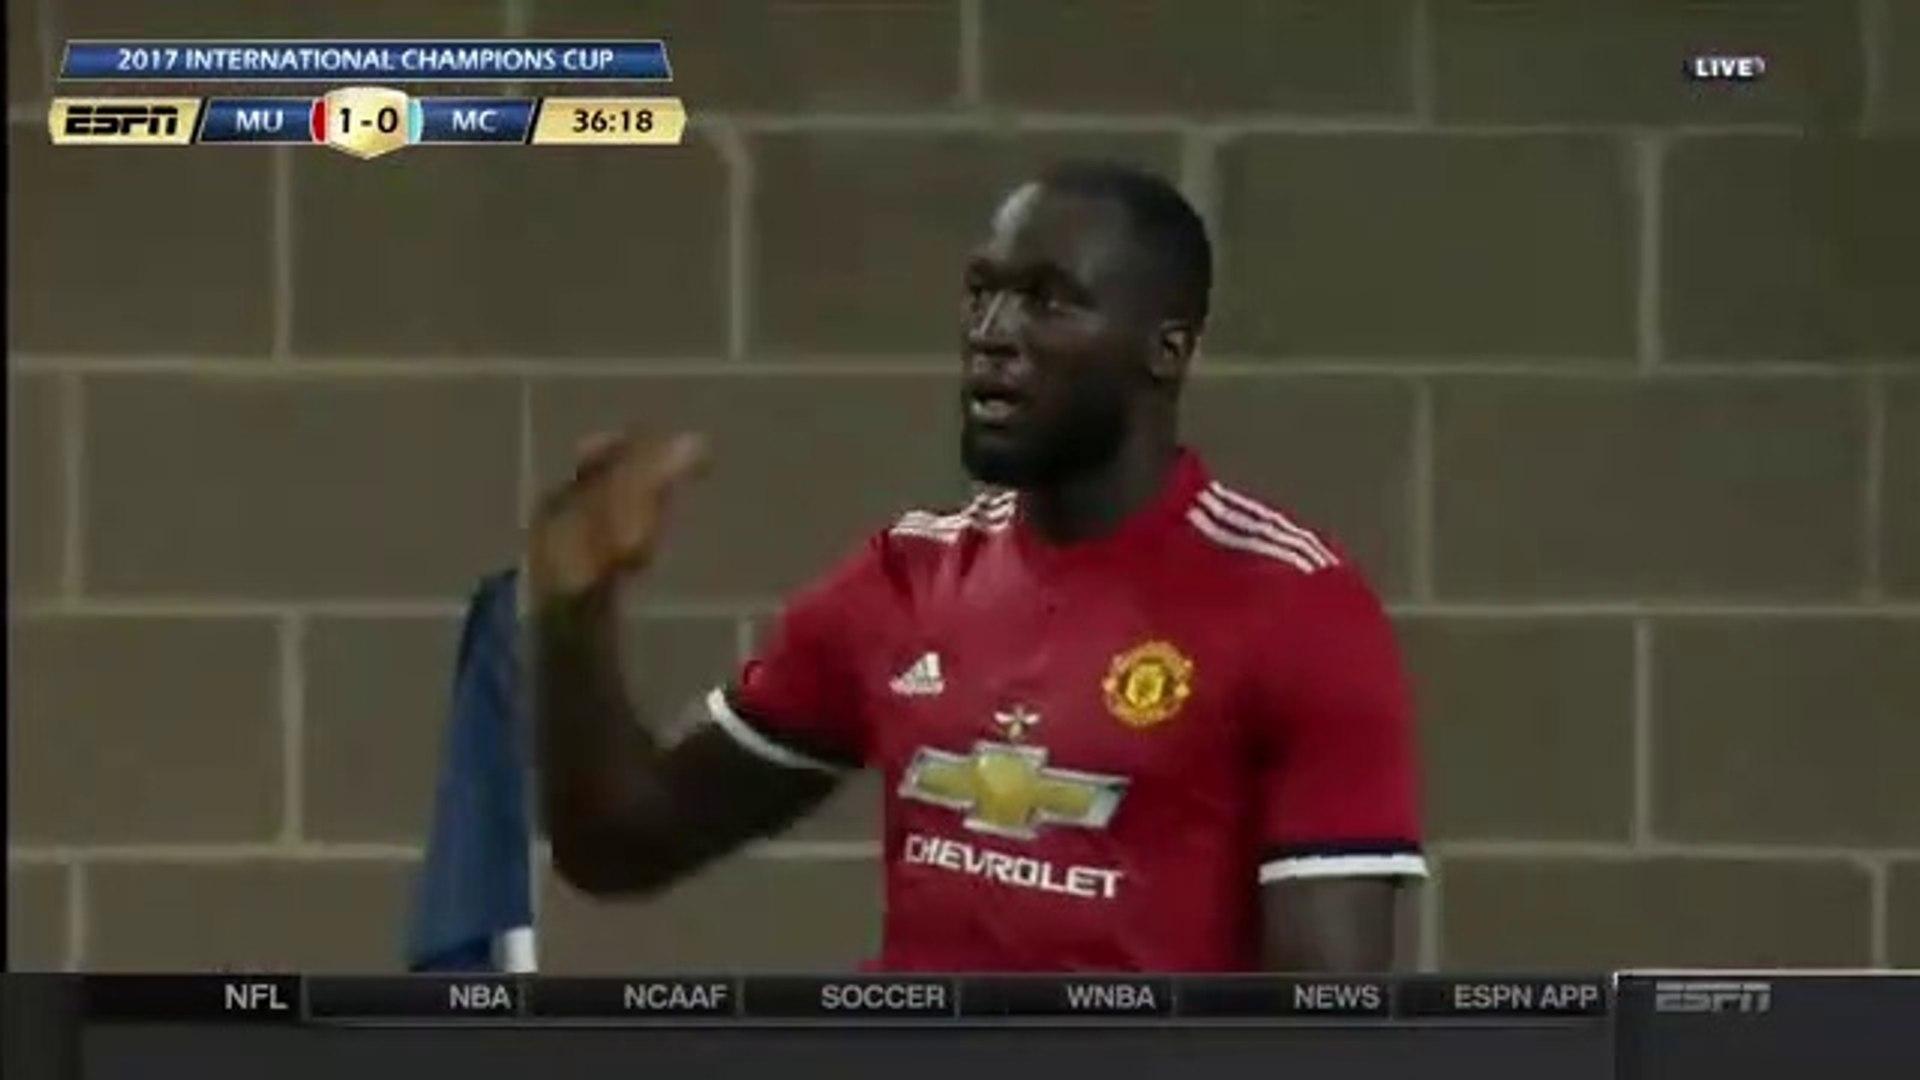 1-0 Romelu Lukaku AMAZING Goal - Manchester United 1-0 Manchester City 21.07.2017